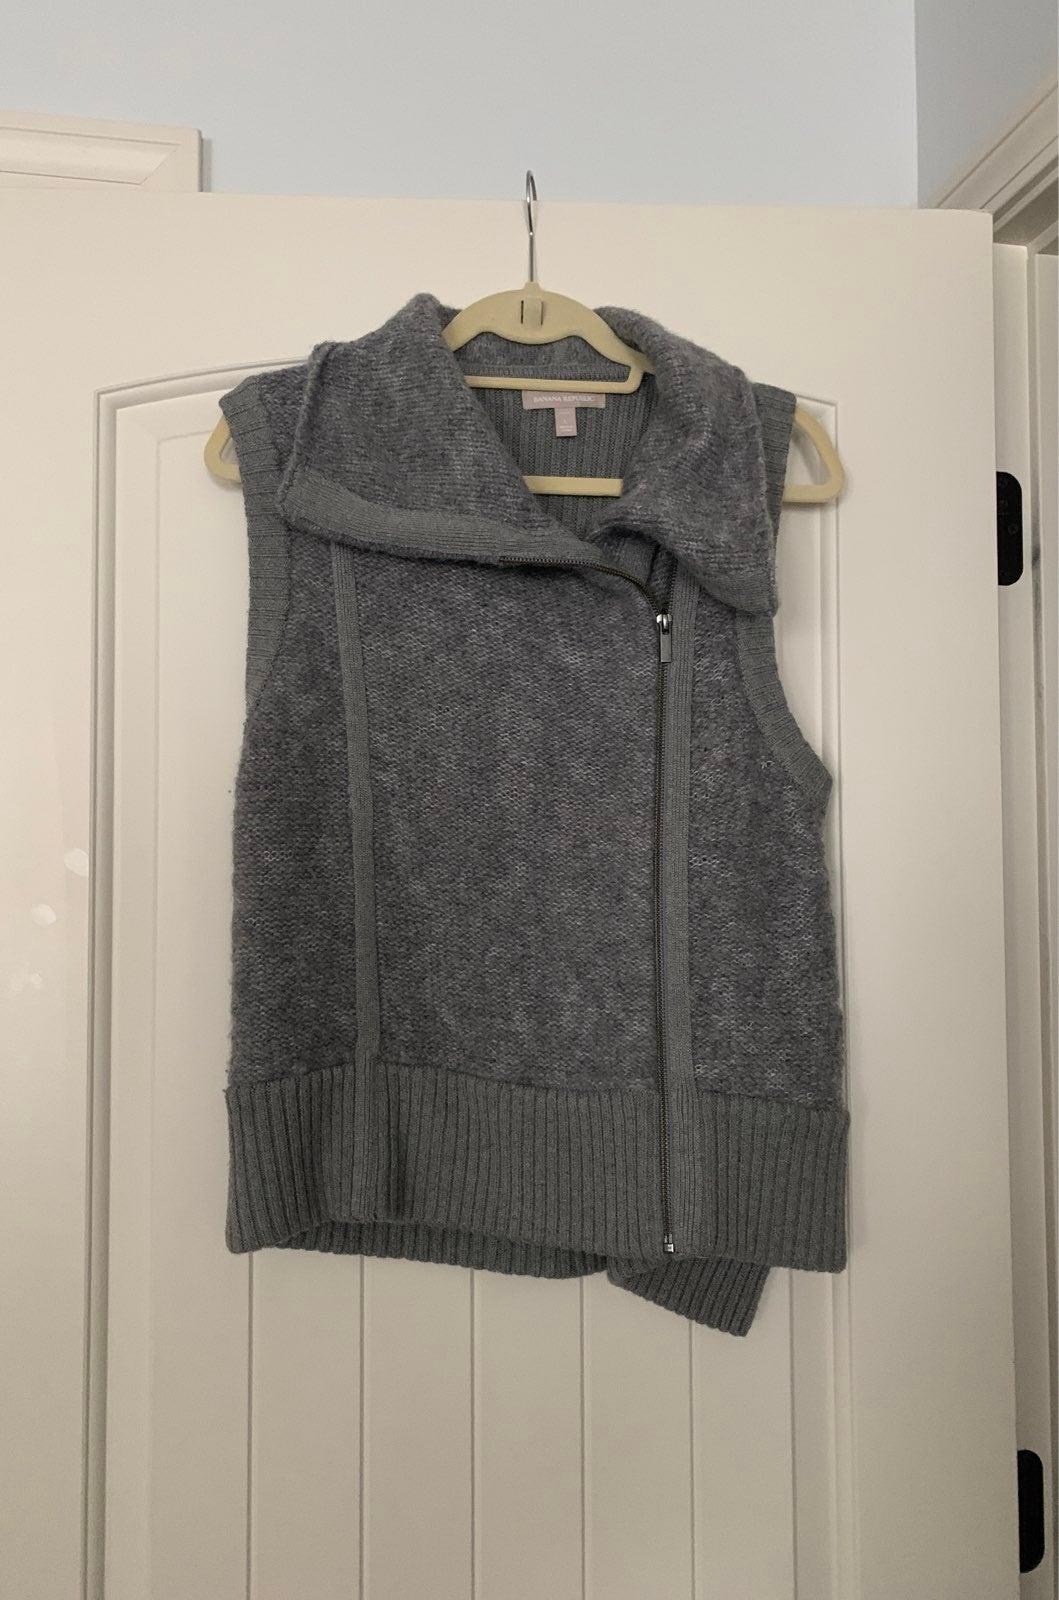 Banana Republic grey vest